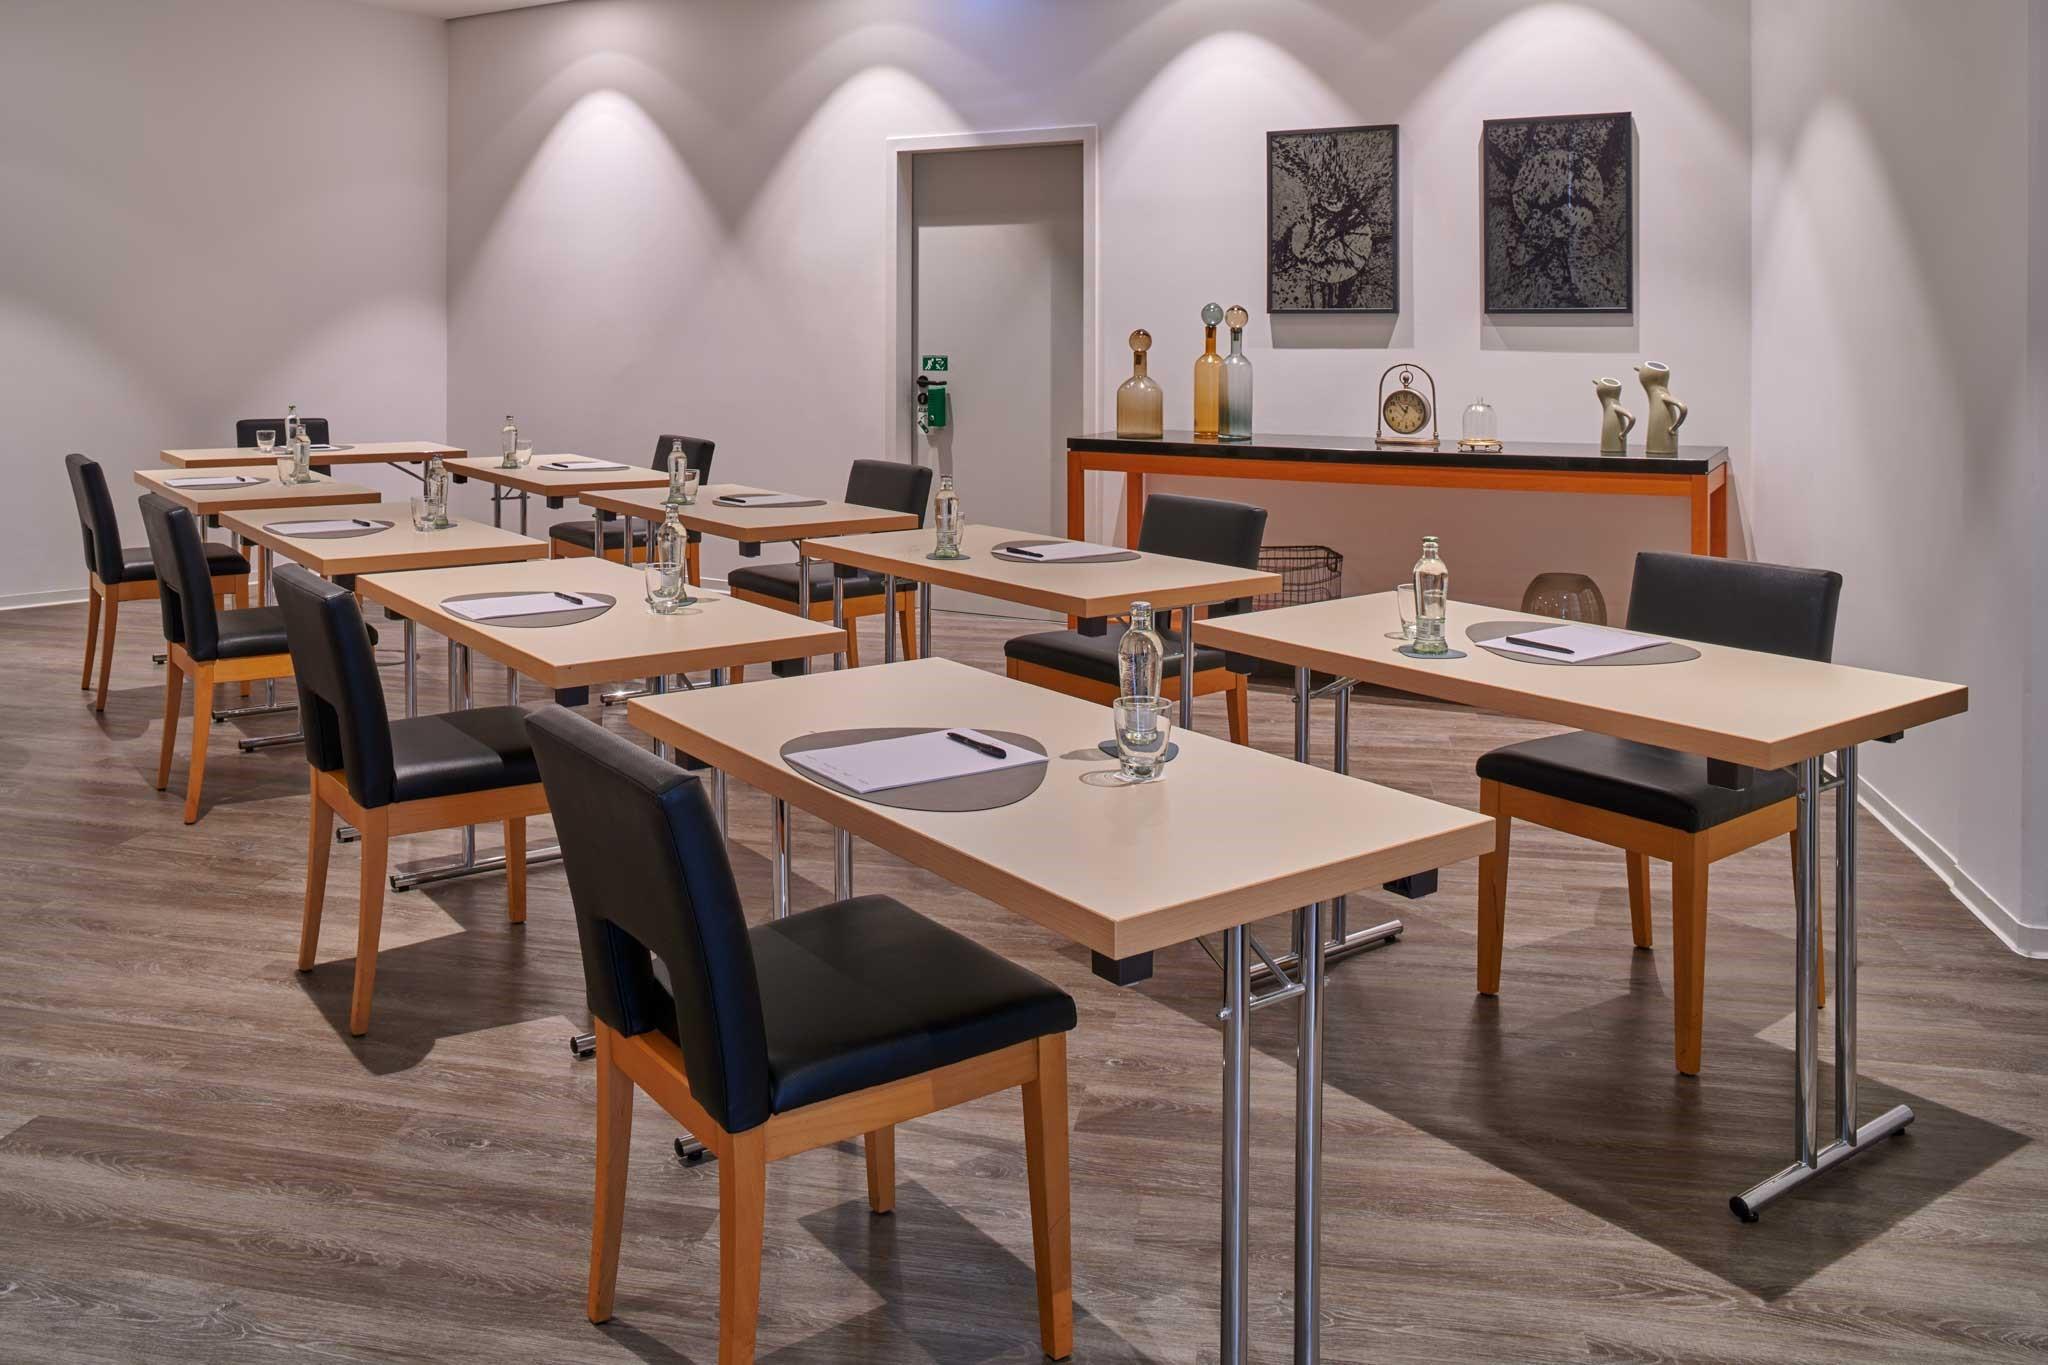 Meeting Room 2 U-Form Corona konform